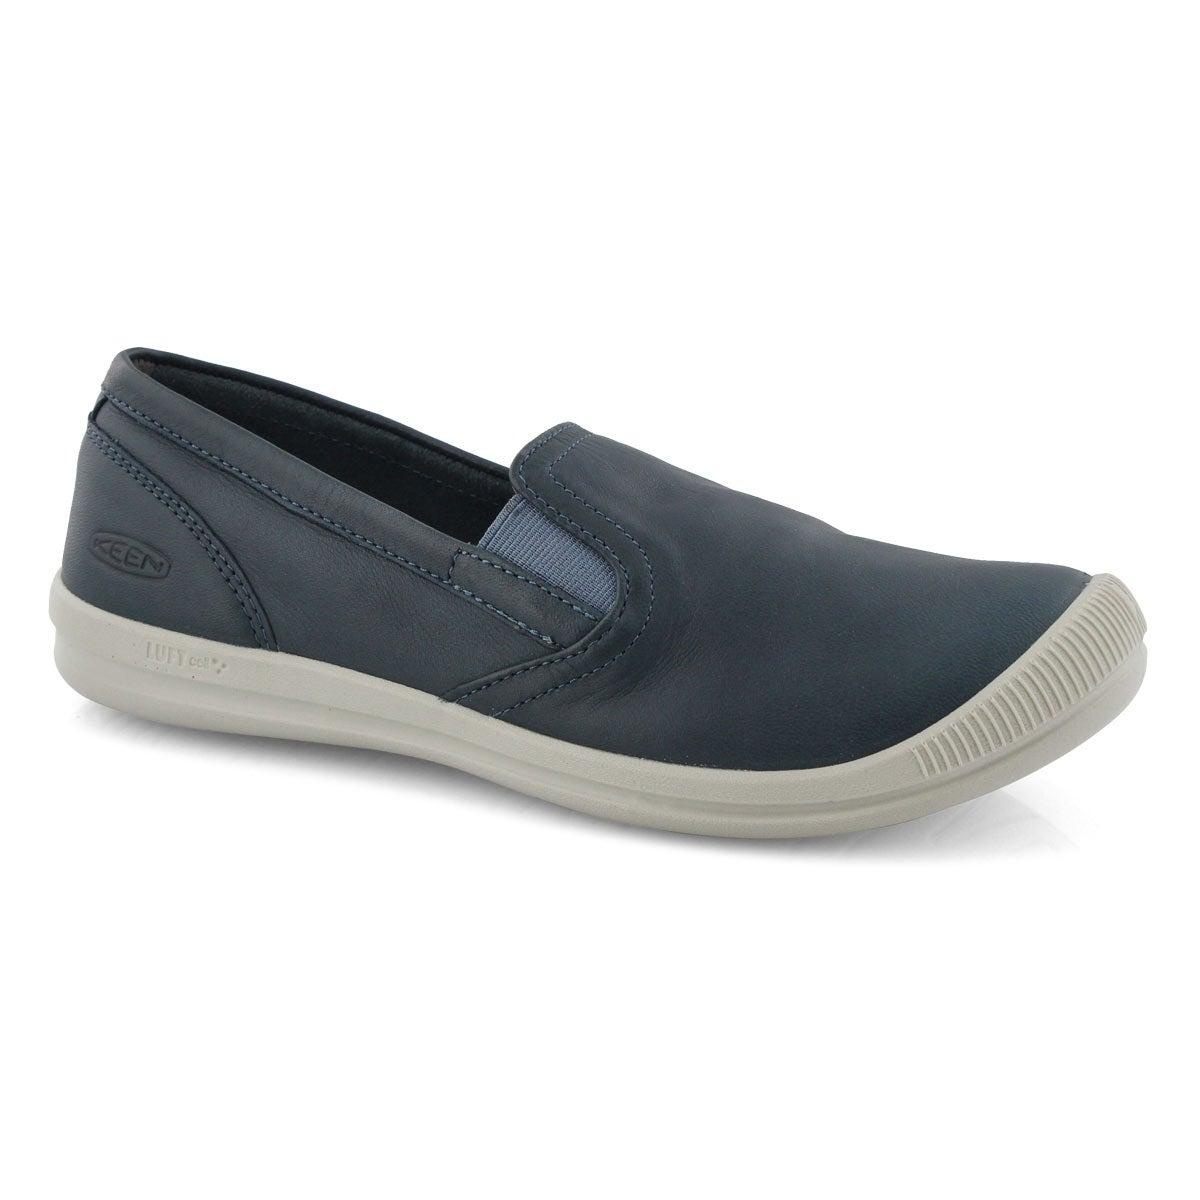 Lds Lorelai blue mirage casual slip on